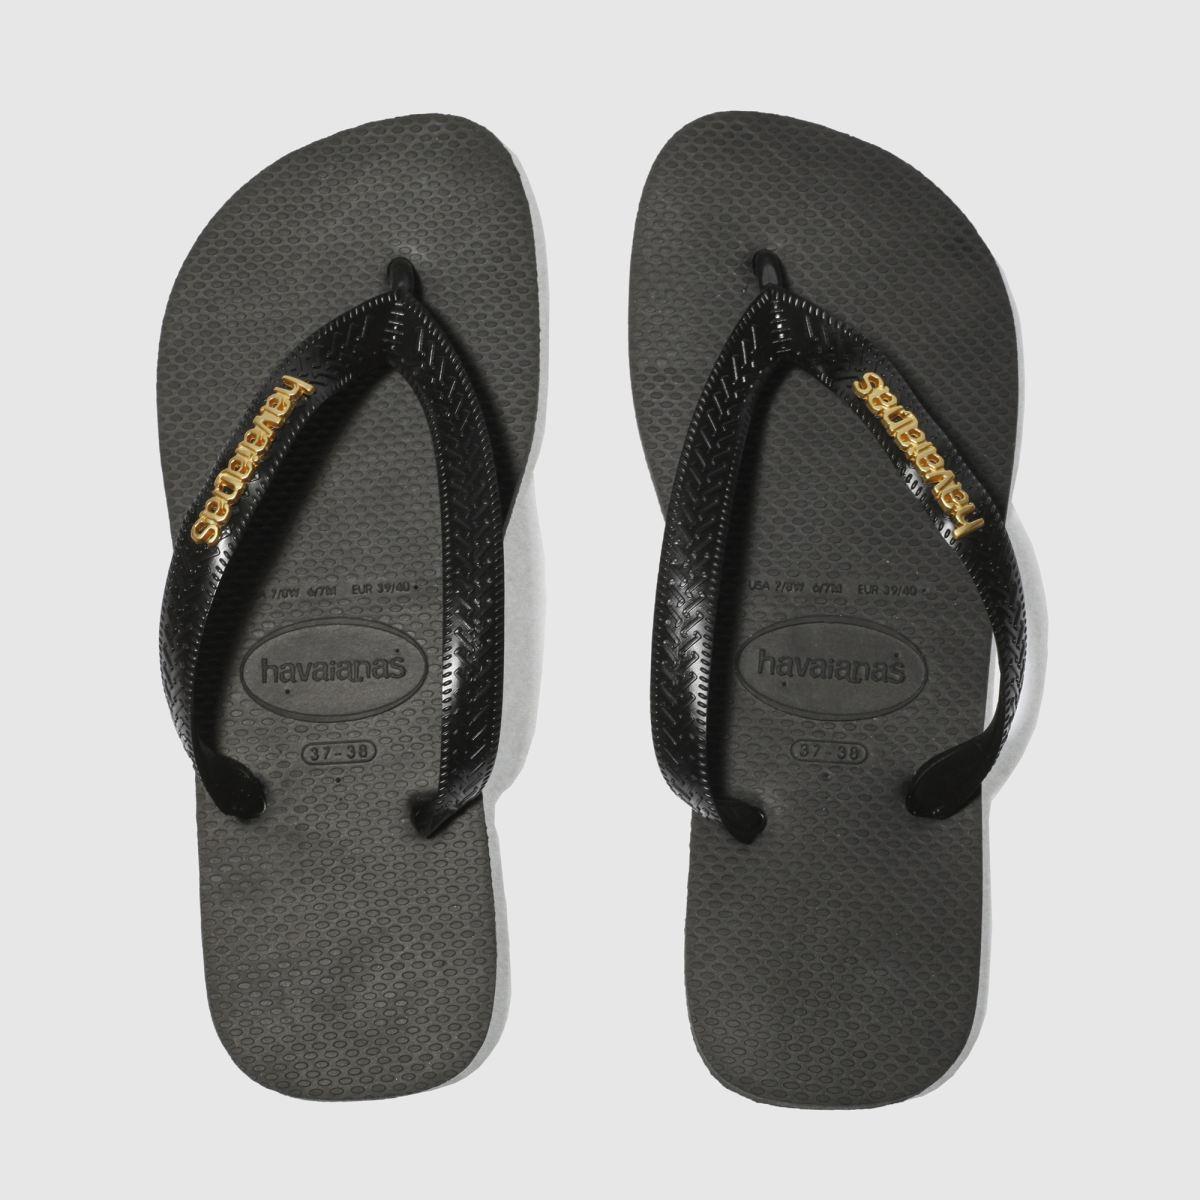 Black sandals ireland - Havaianas Black Gold Top Logo Metallic Womens Sandals